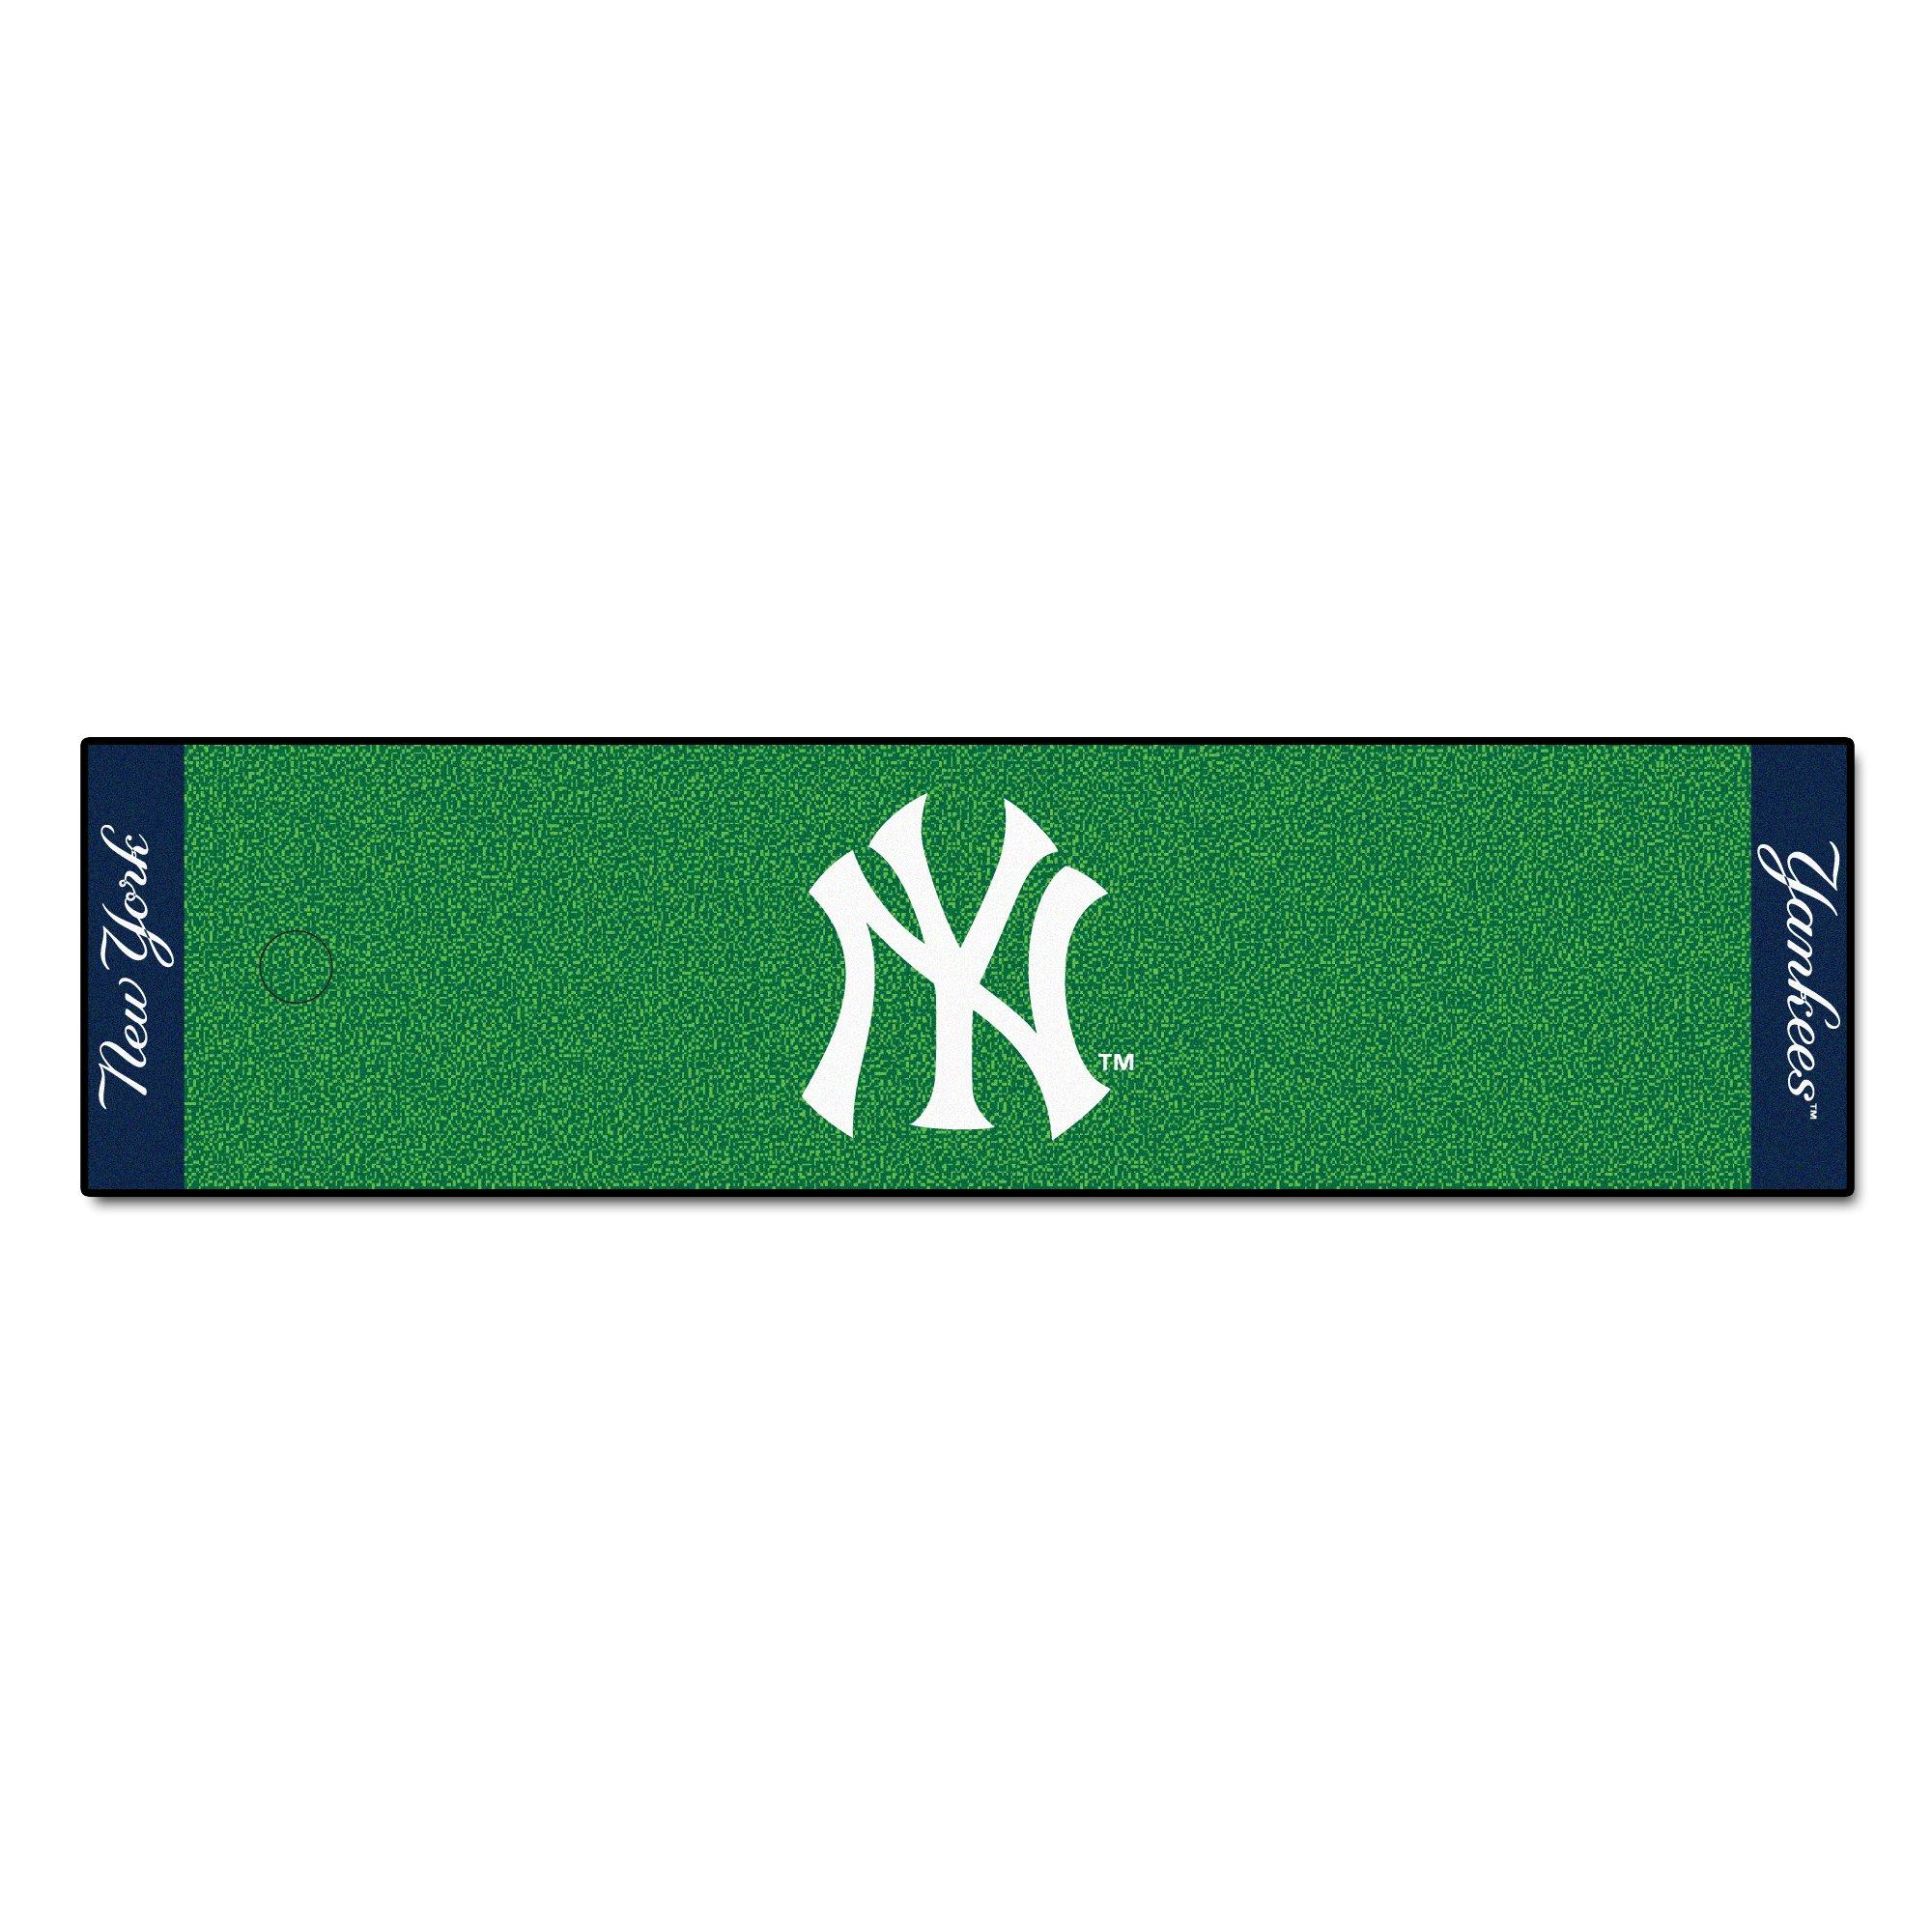 FANMATS MLB New York Yankees Nylon Face Putting Green Mat (9062)